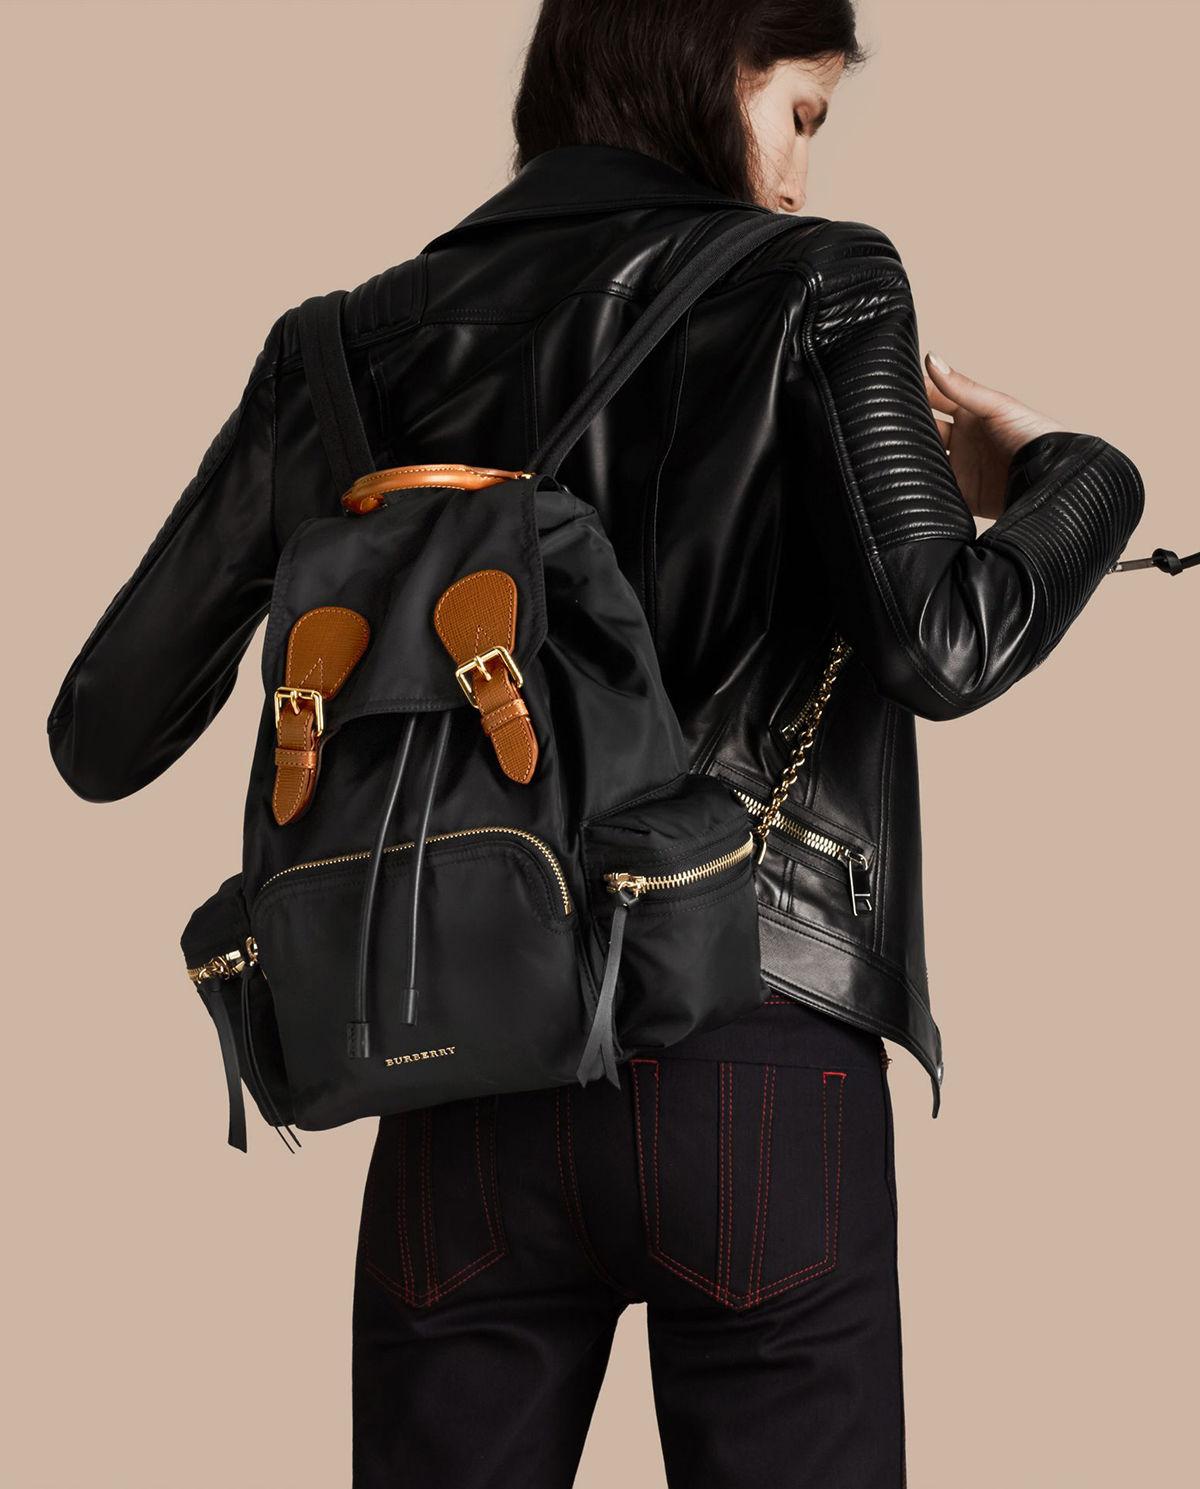 9e7843ab9ebee Plecak BURBERRY – Kup Teraz! Najlepsze ceny i opinie! Sklep Moliera2.com